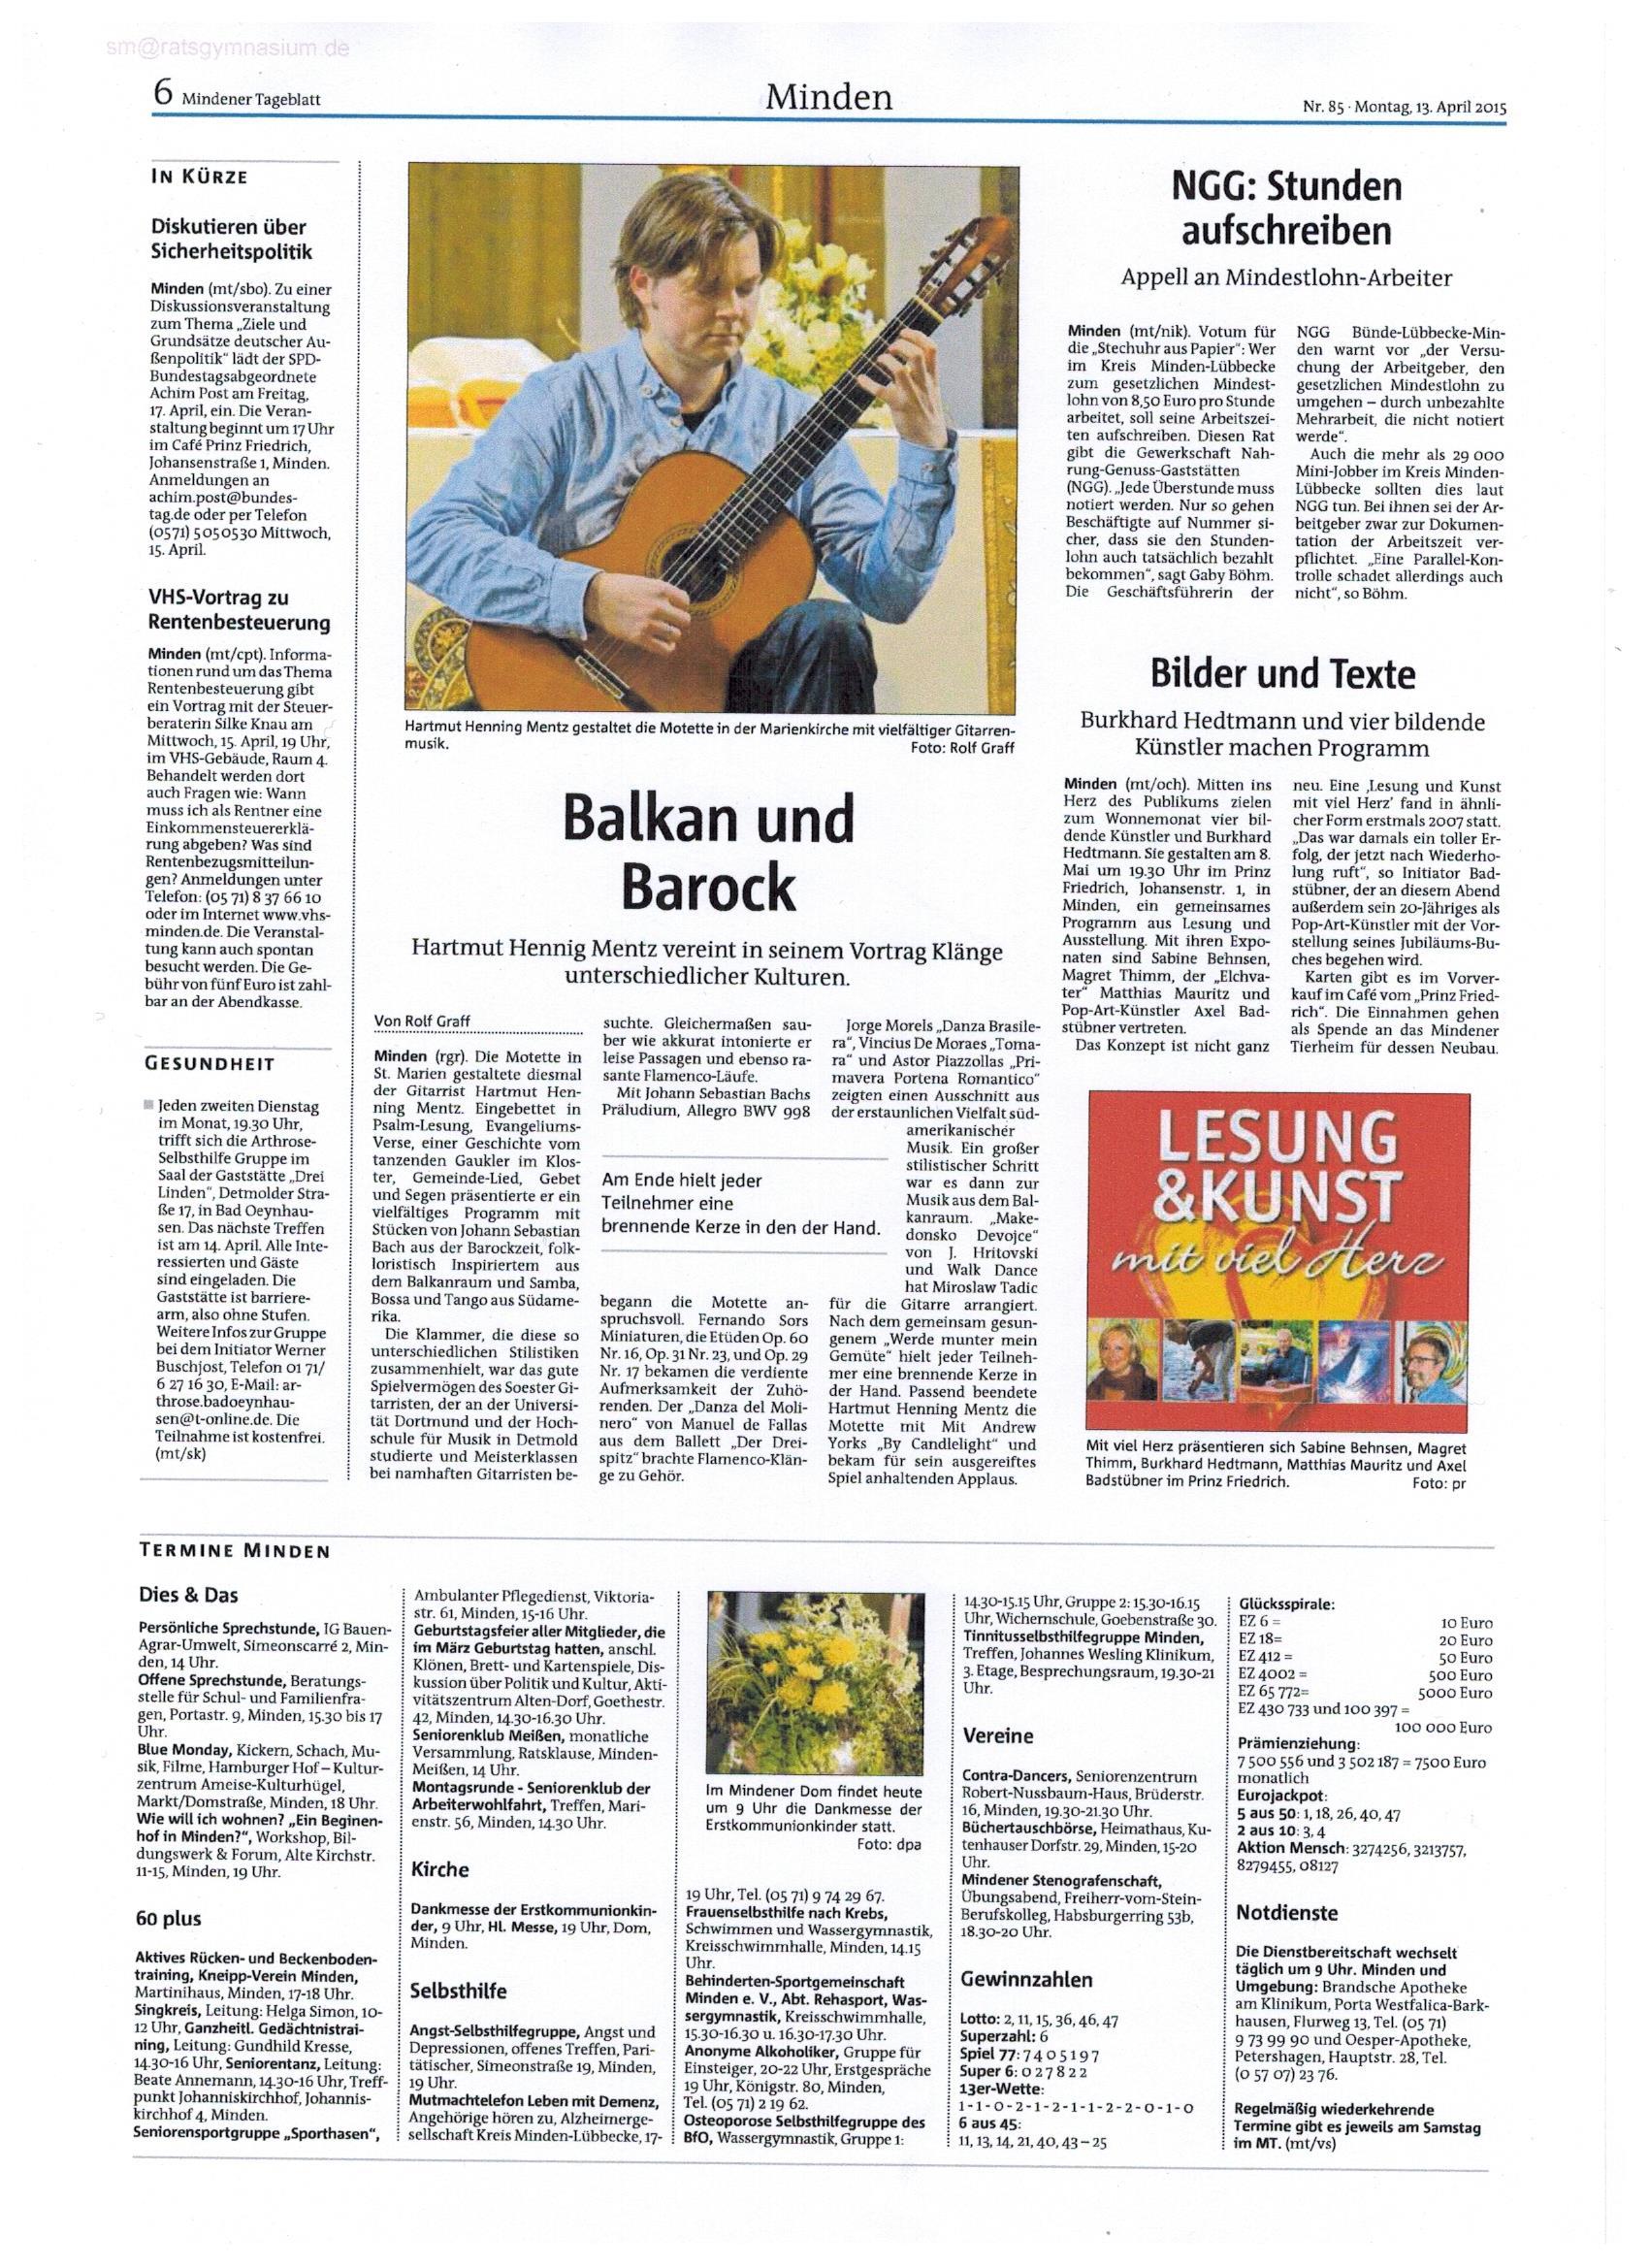 Mindener Tageblatt, http://www.mt.de/